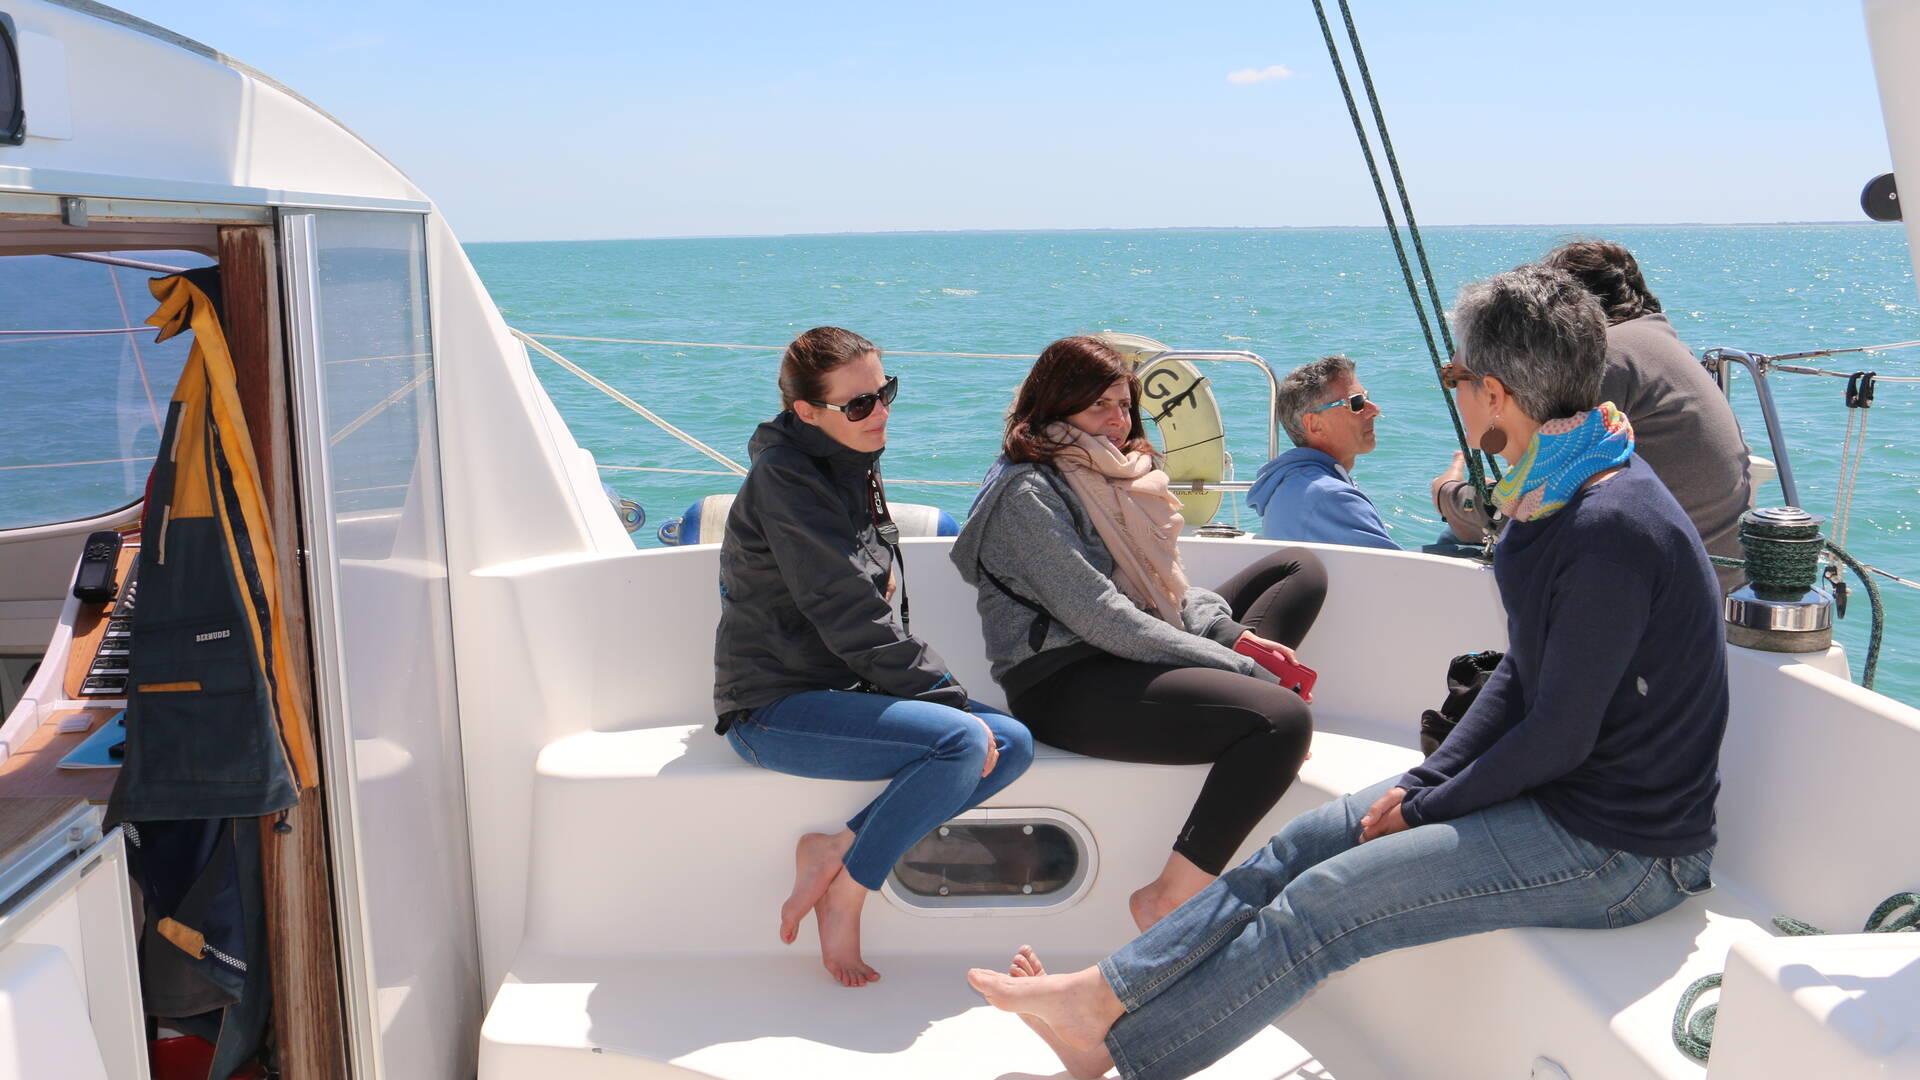 Convivialité à bord du catamaran Vertige